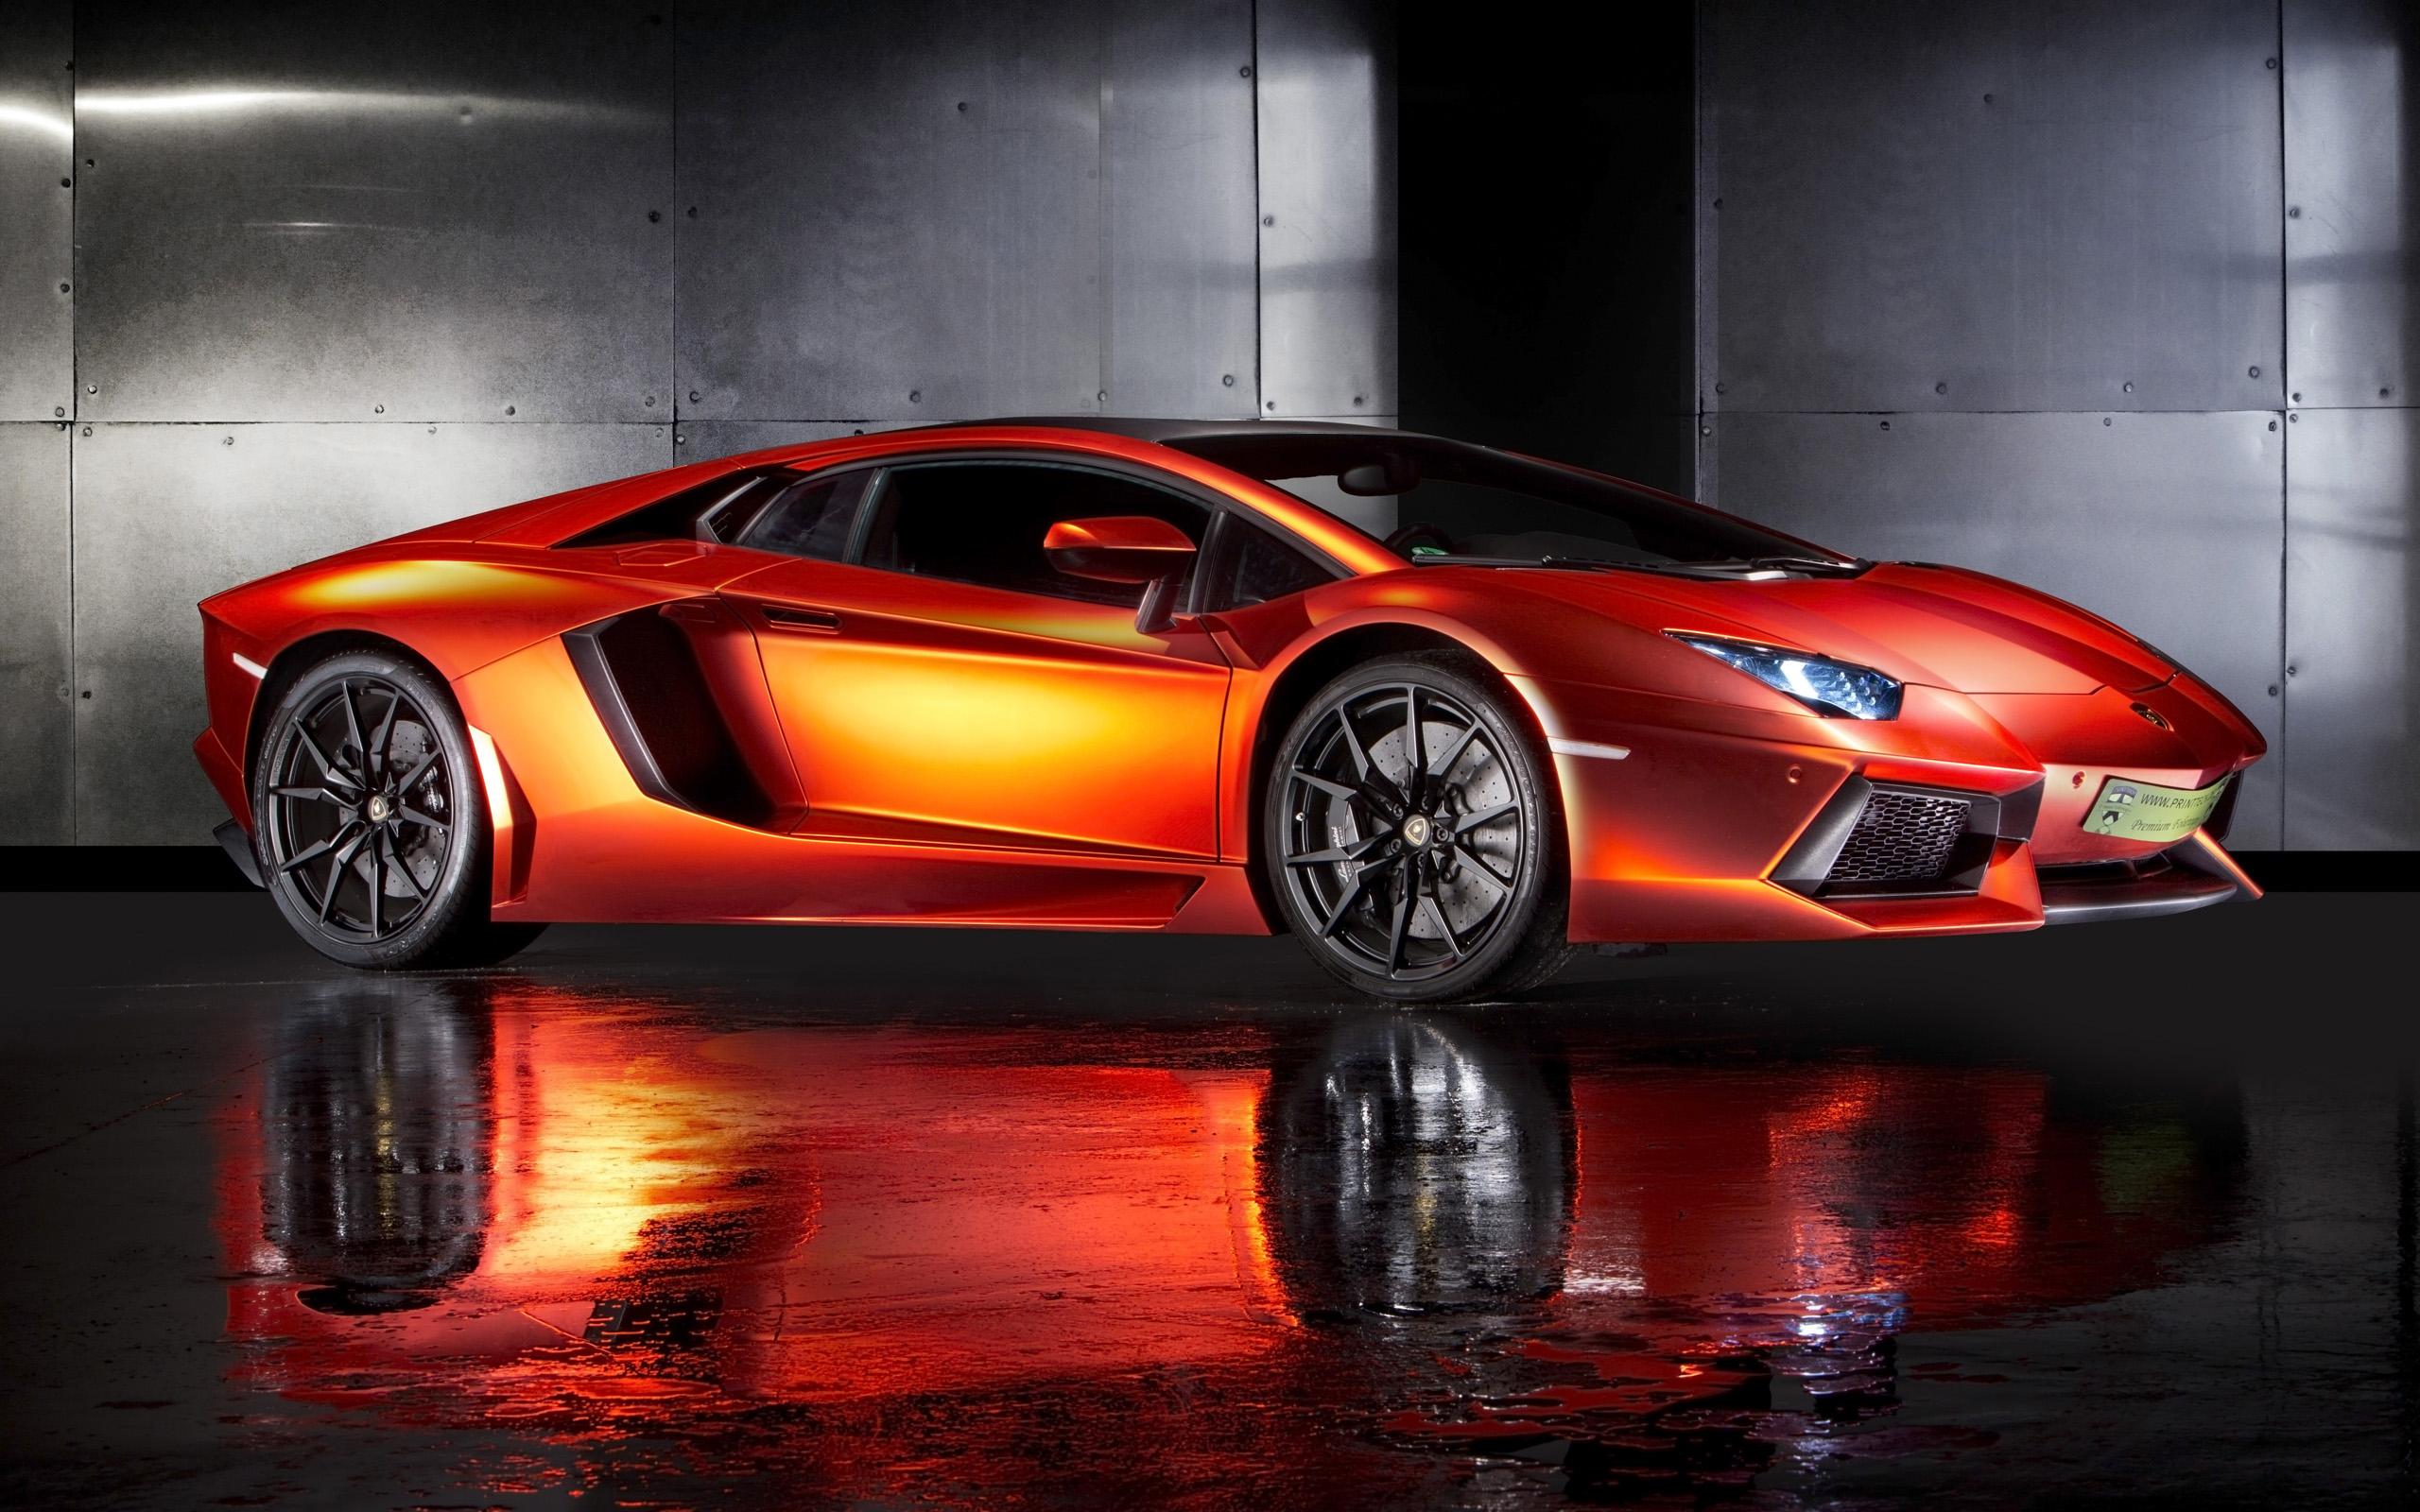 Lamborghini Aventador supercar wallpaper Available in 2560 x 1600 2560x1600